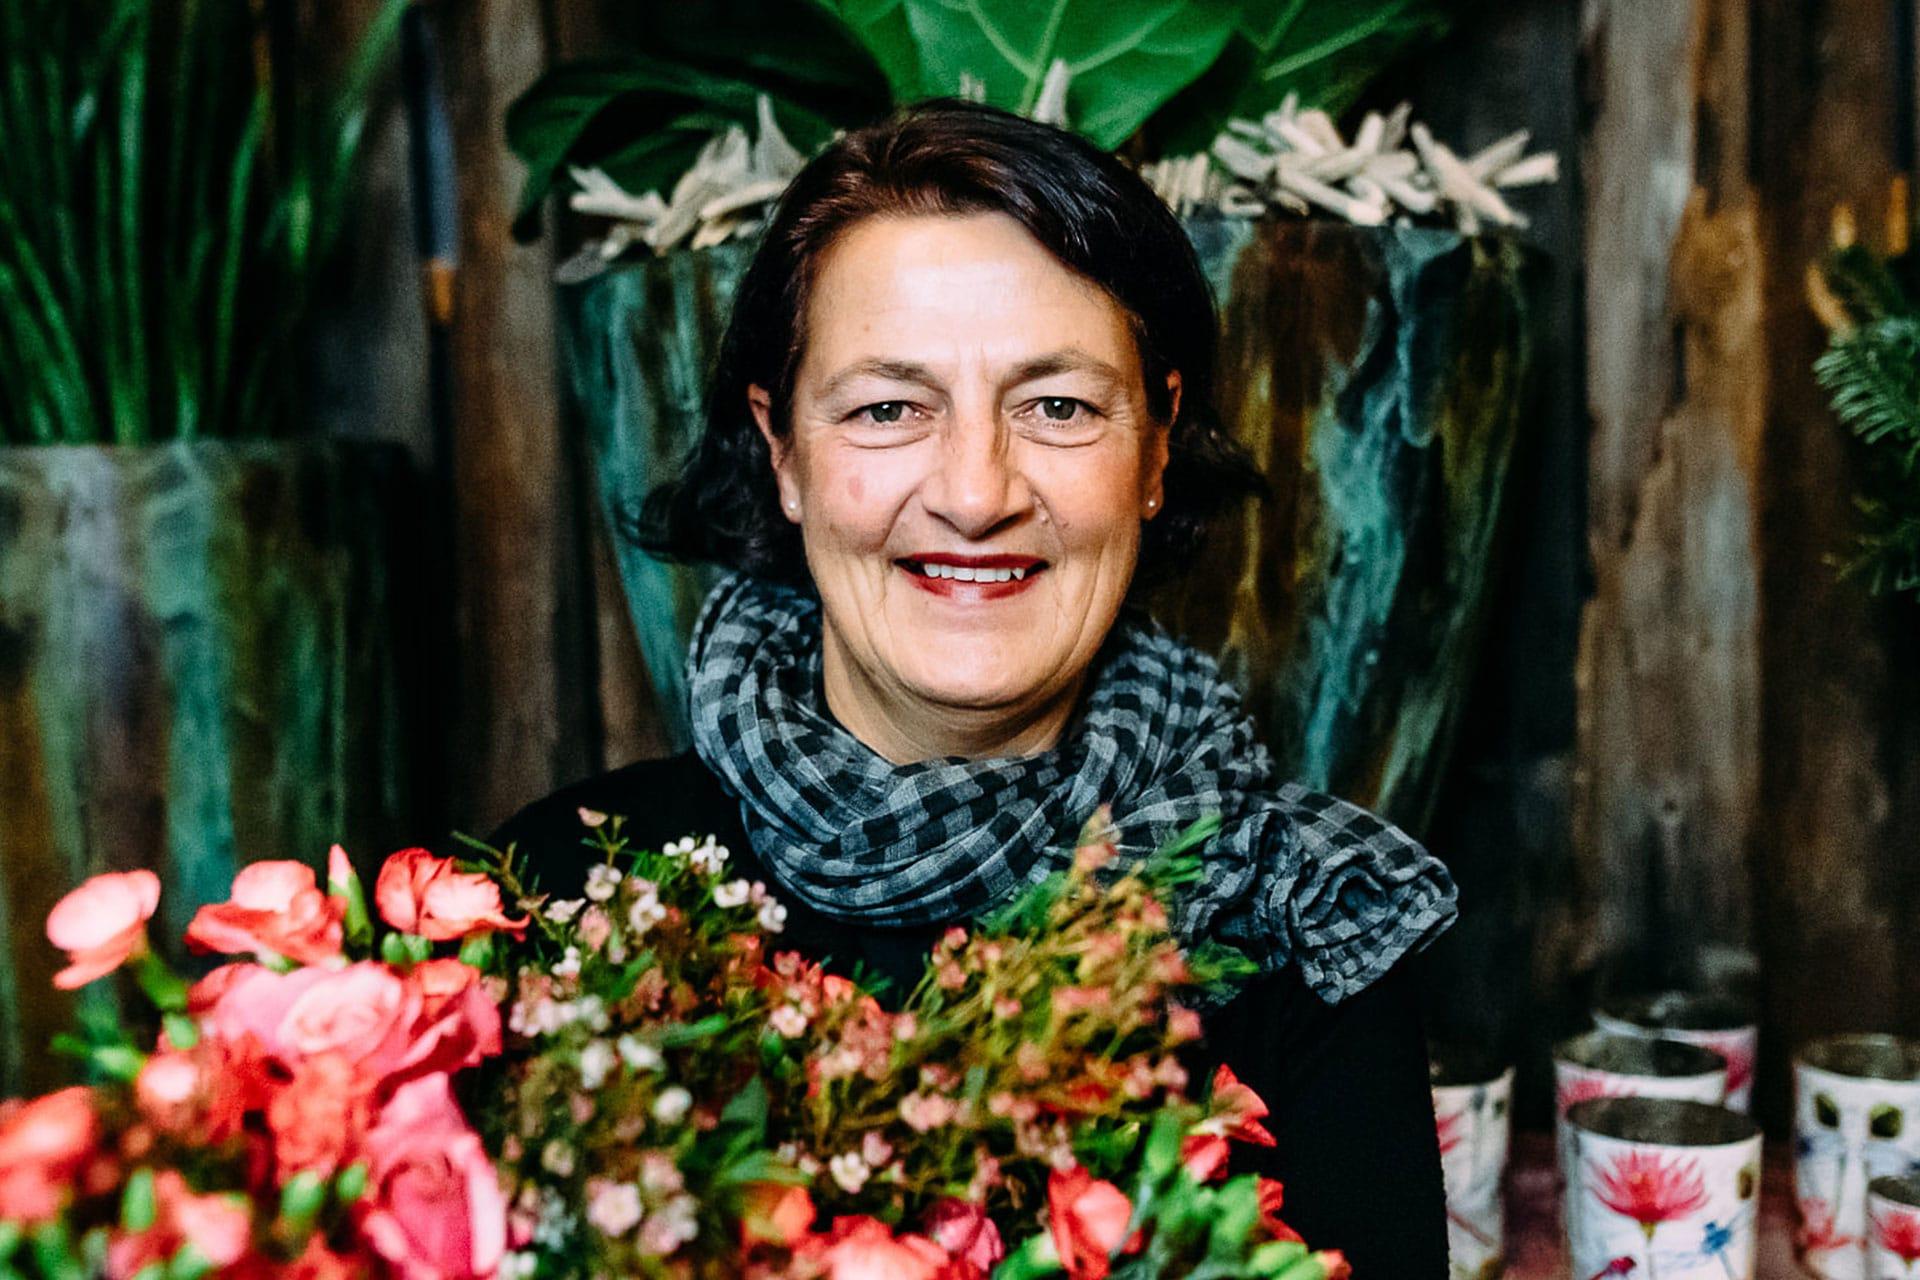 Heidi Dohnal